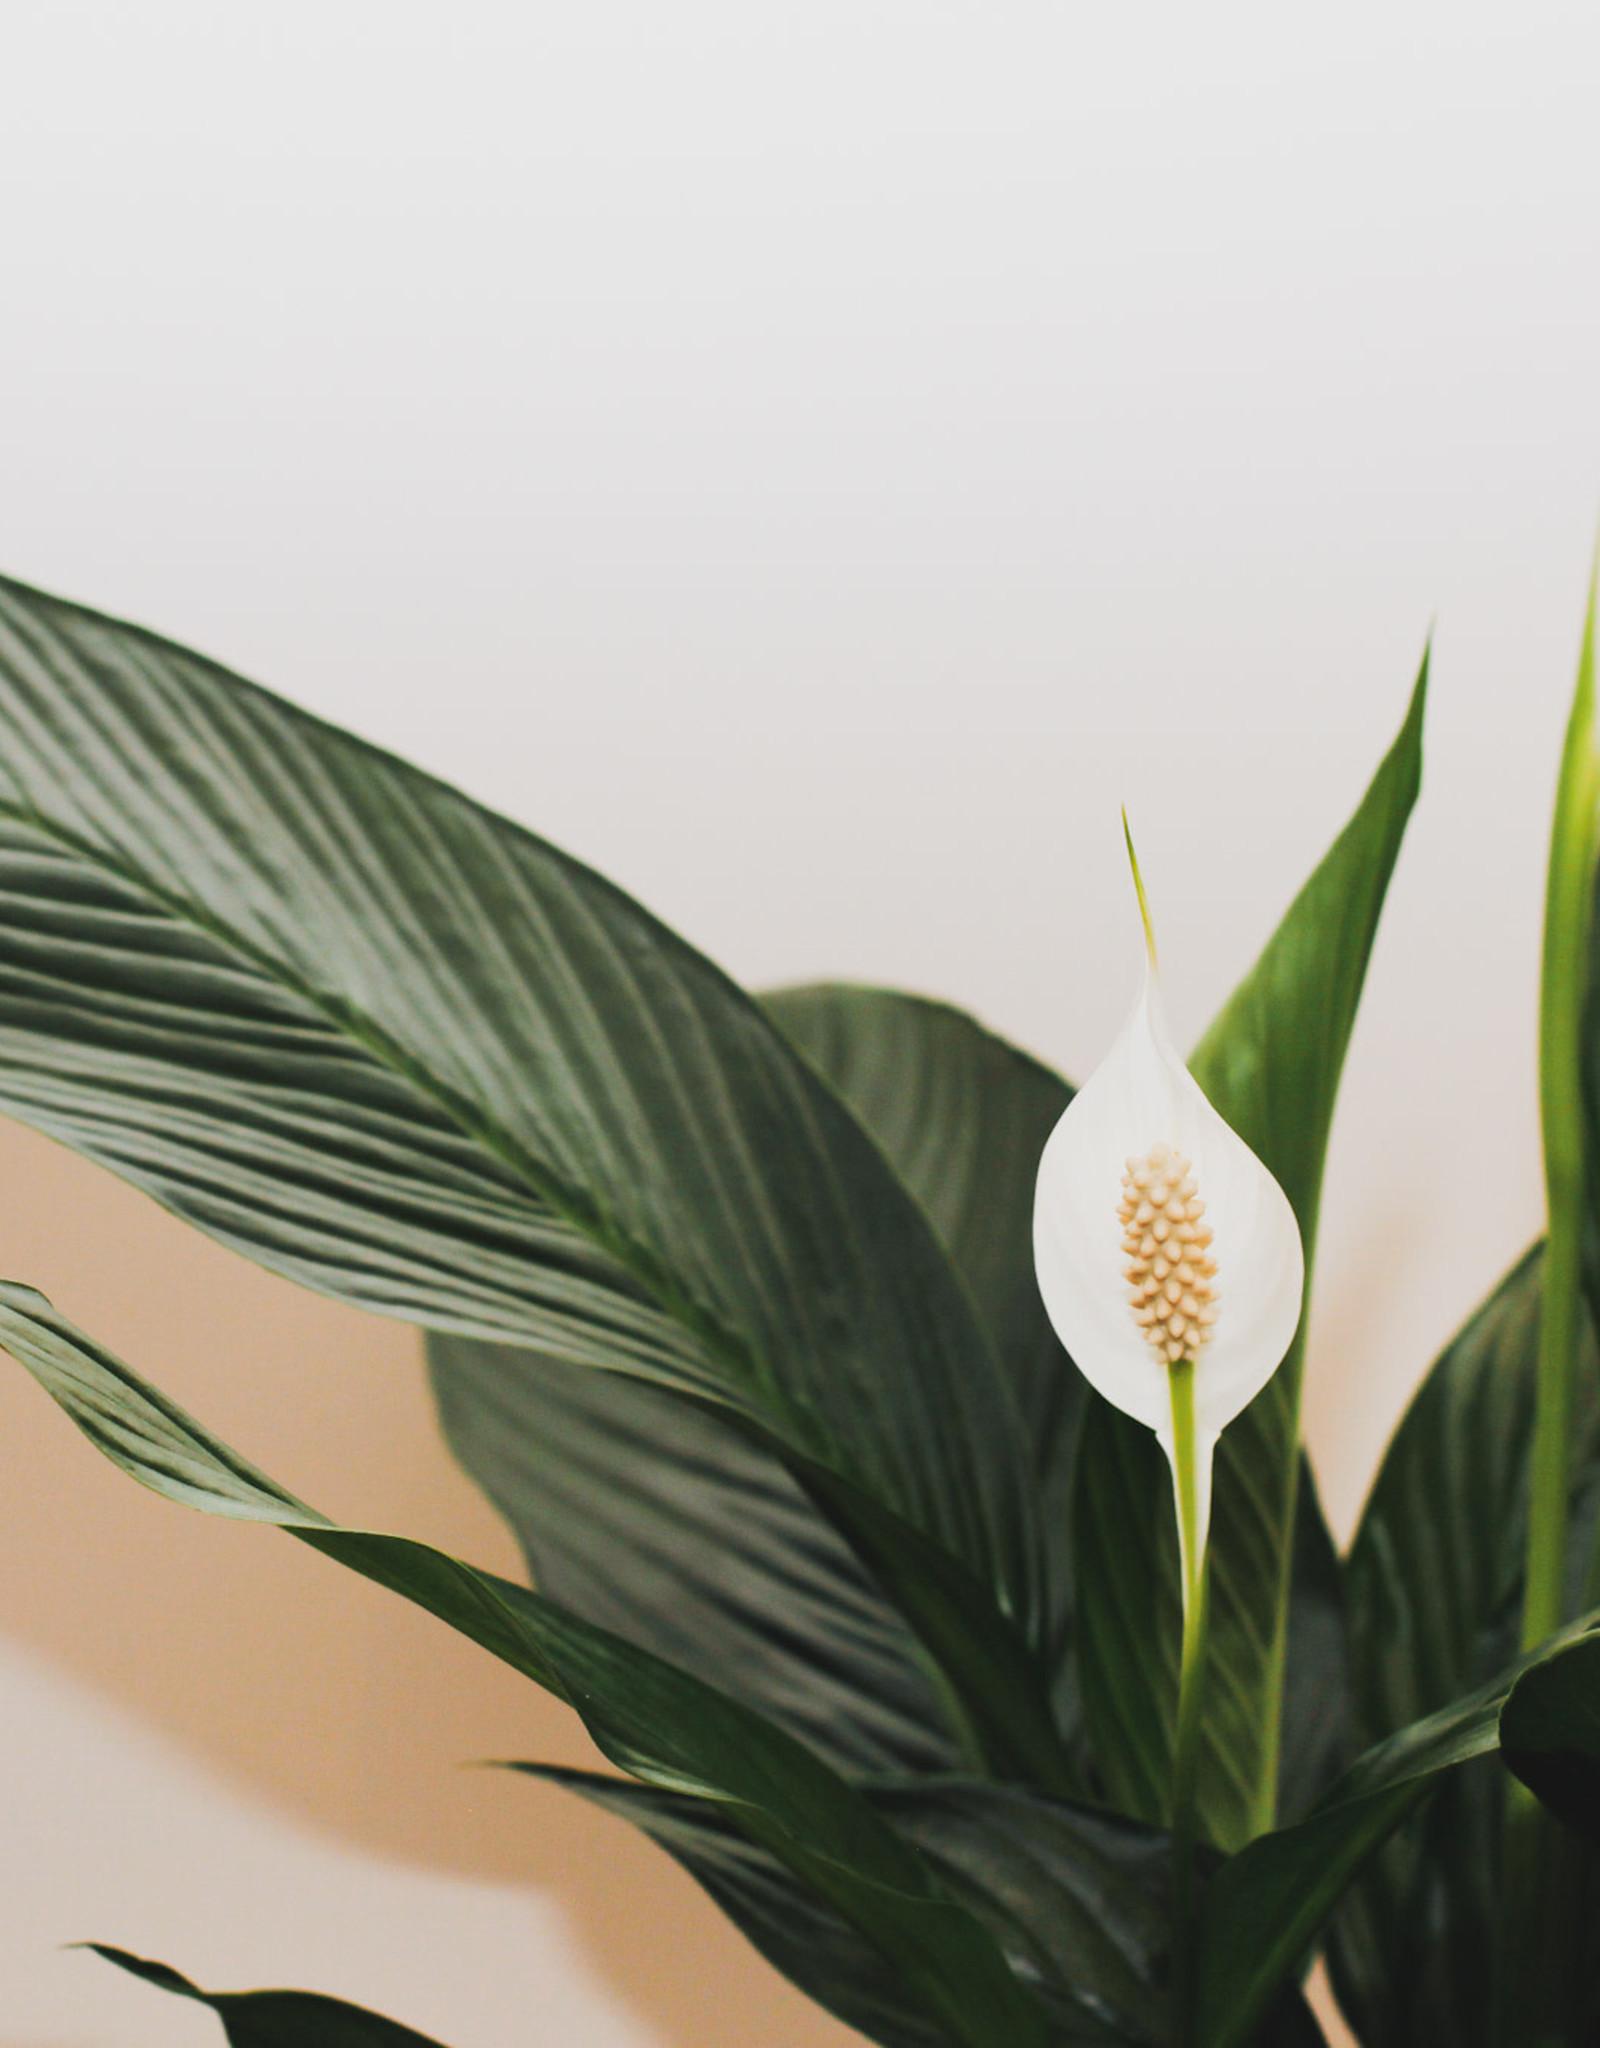 Spathiphyllum Spathiphyllum bingo cupid D19